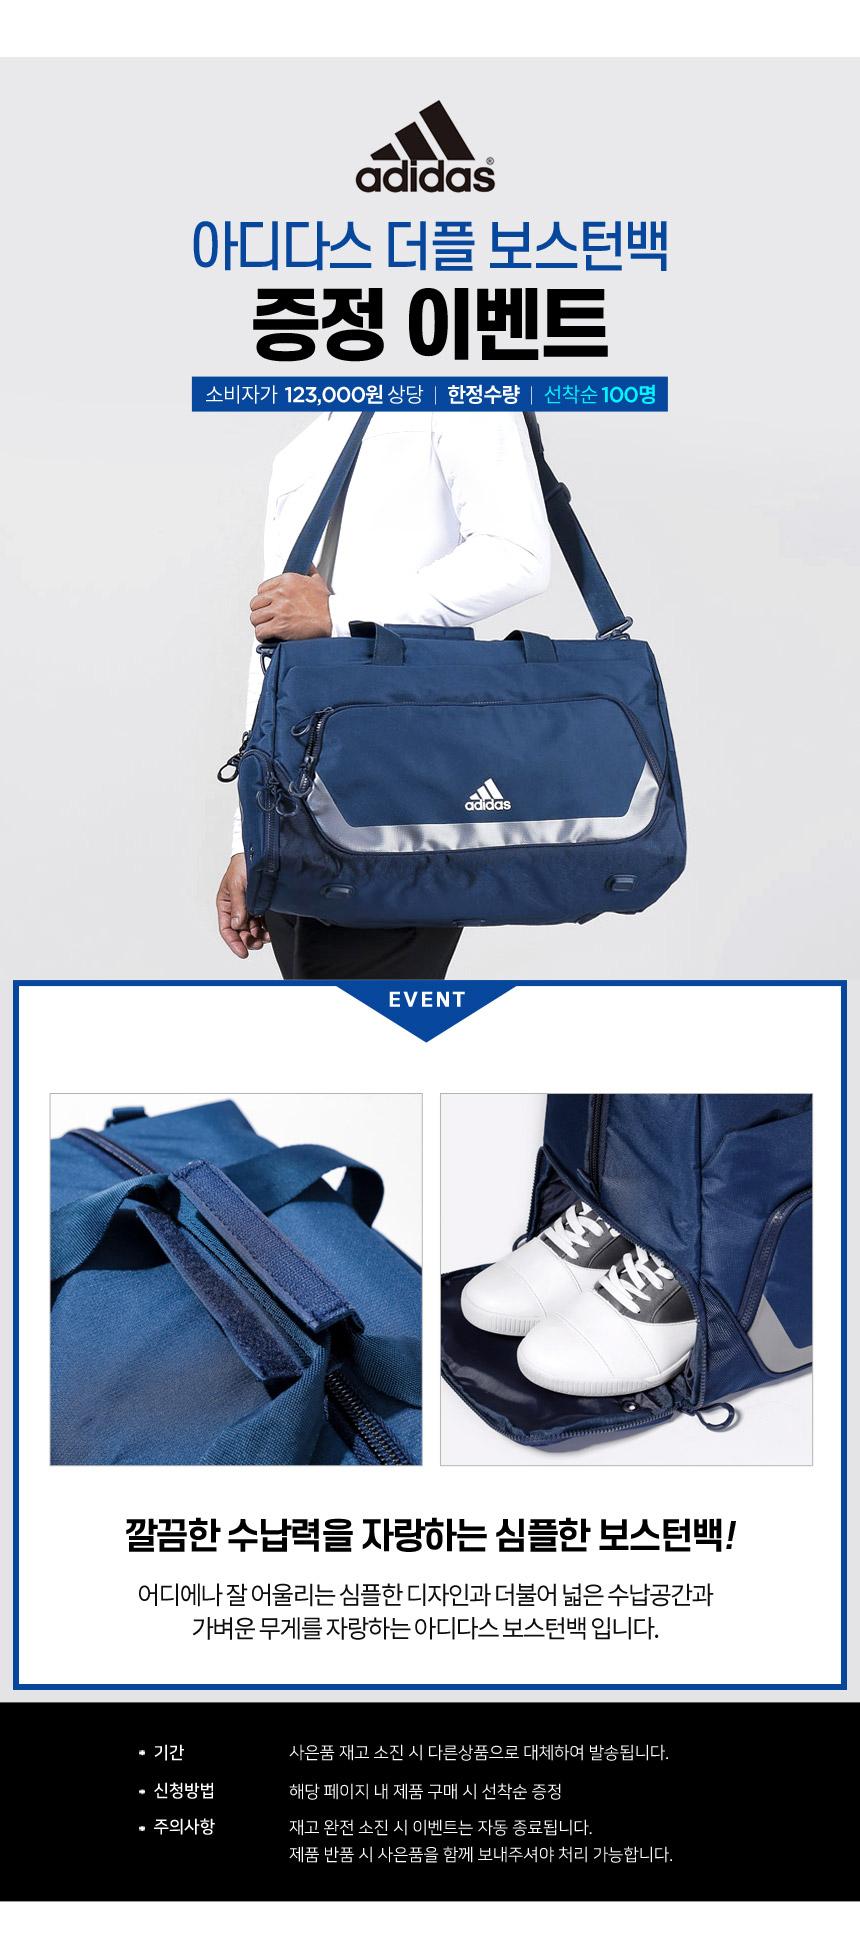 adidas_duffle_bostonbag_gift_21.jpg